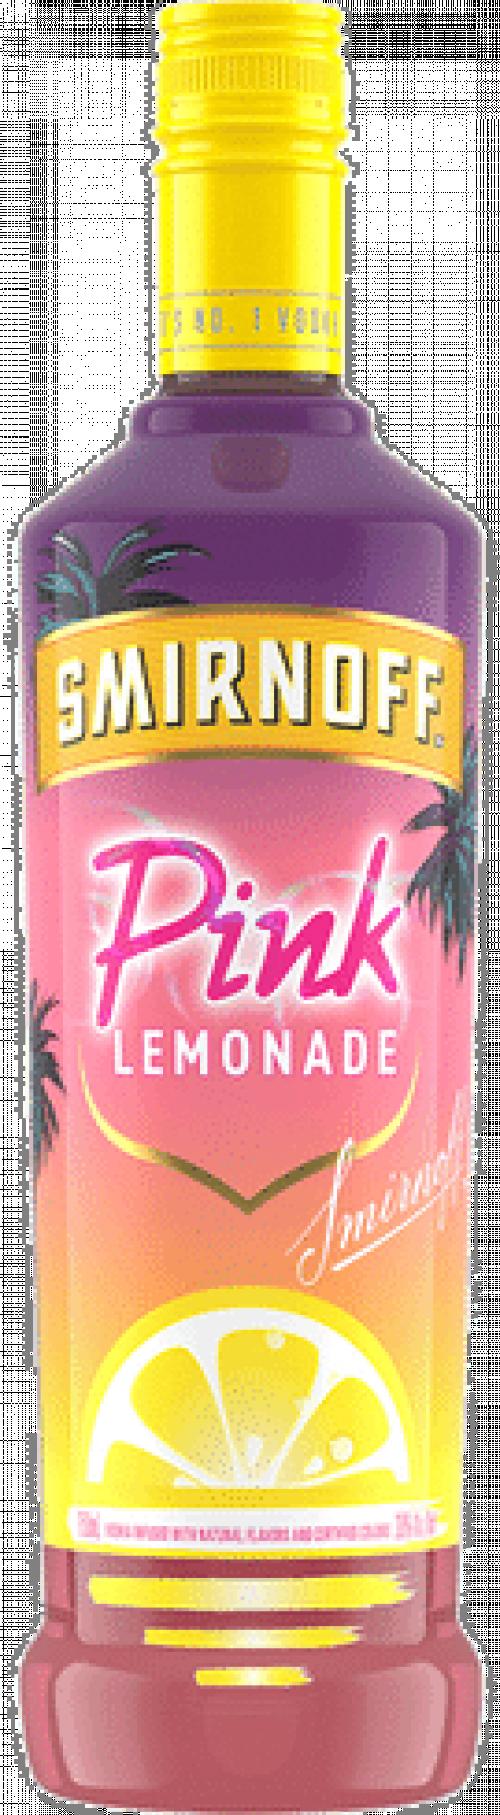 Smirnoff Pink Lemonade Vodka 750ml